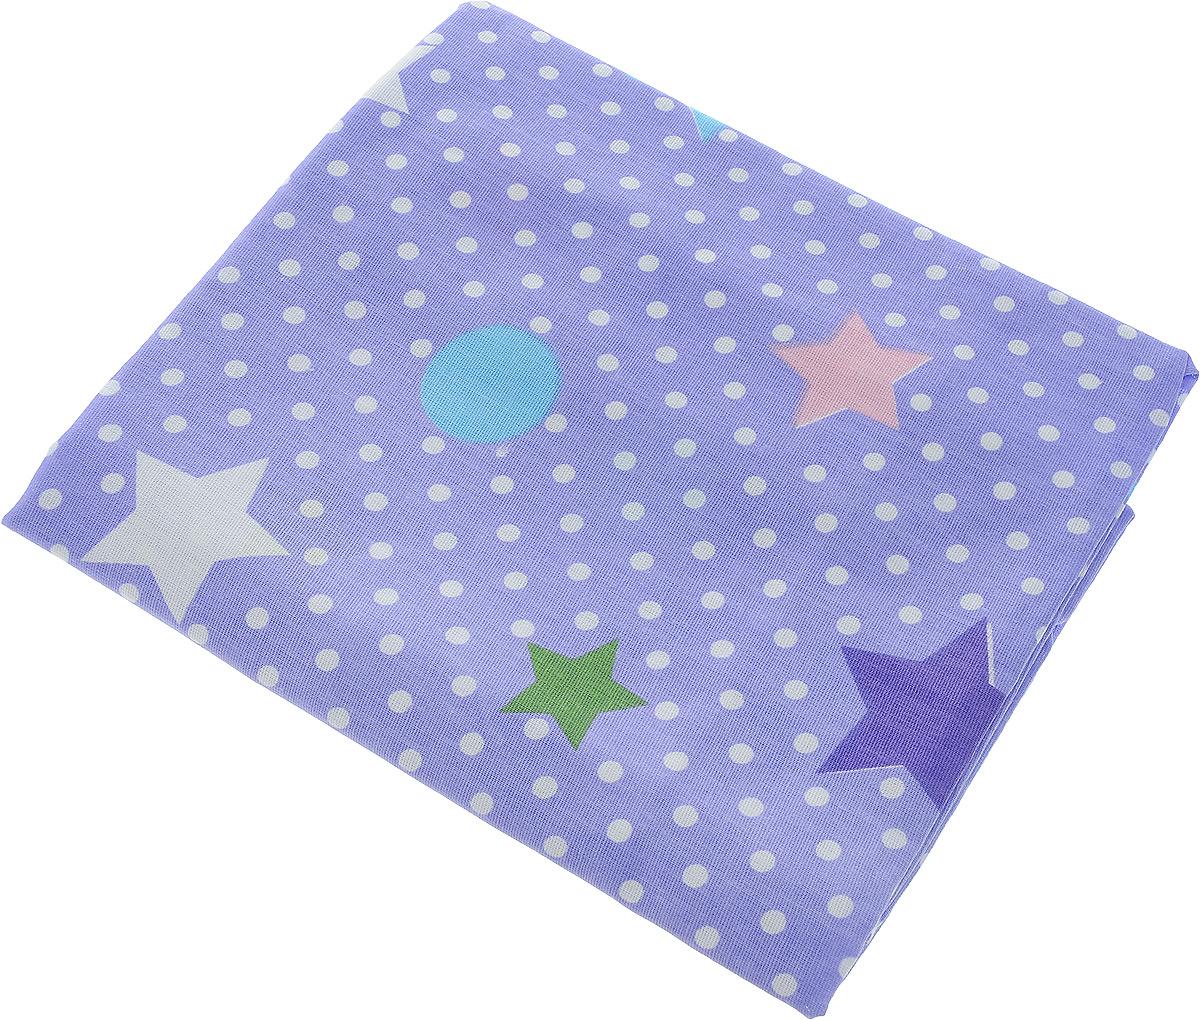 Bonne Fee Простыня детская Совы цвет фиолетовый 70 х 120 см